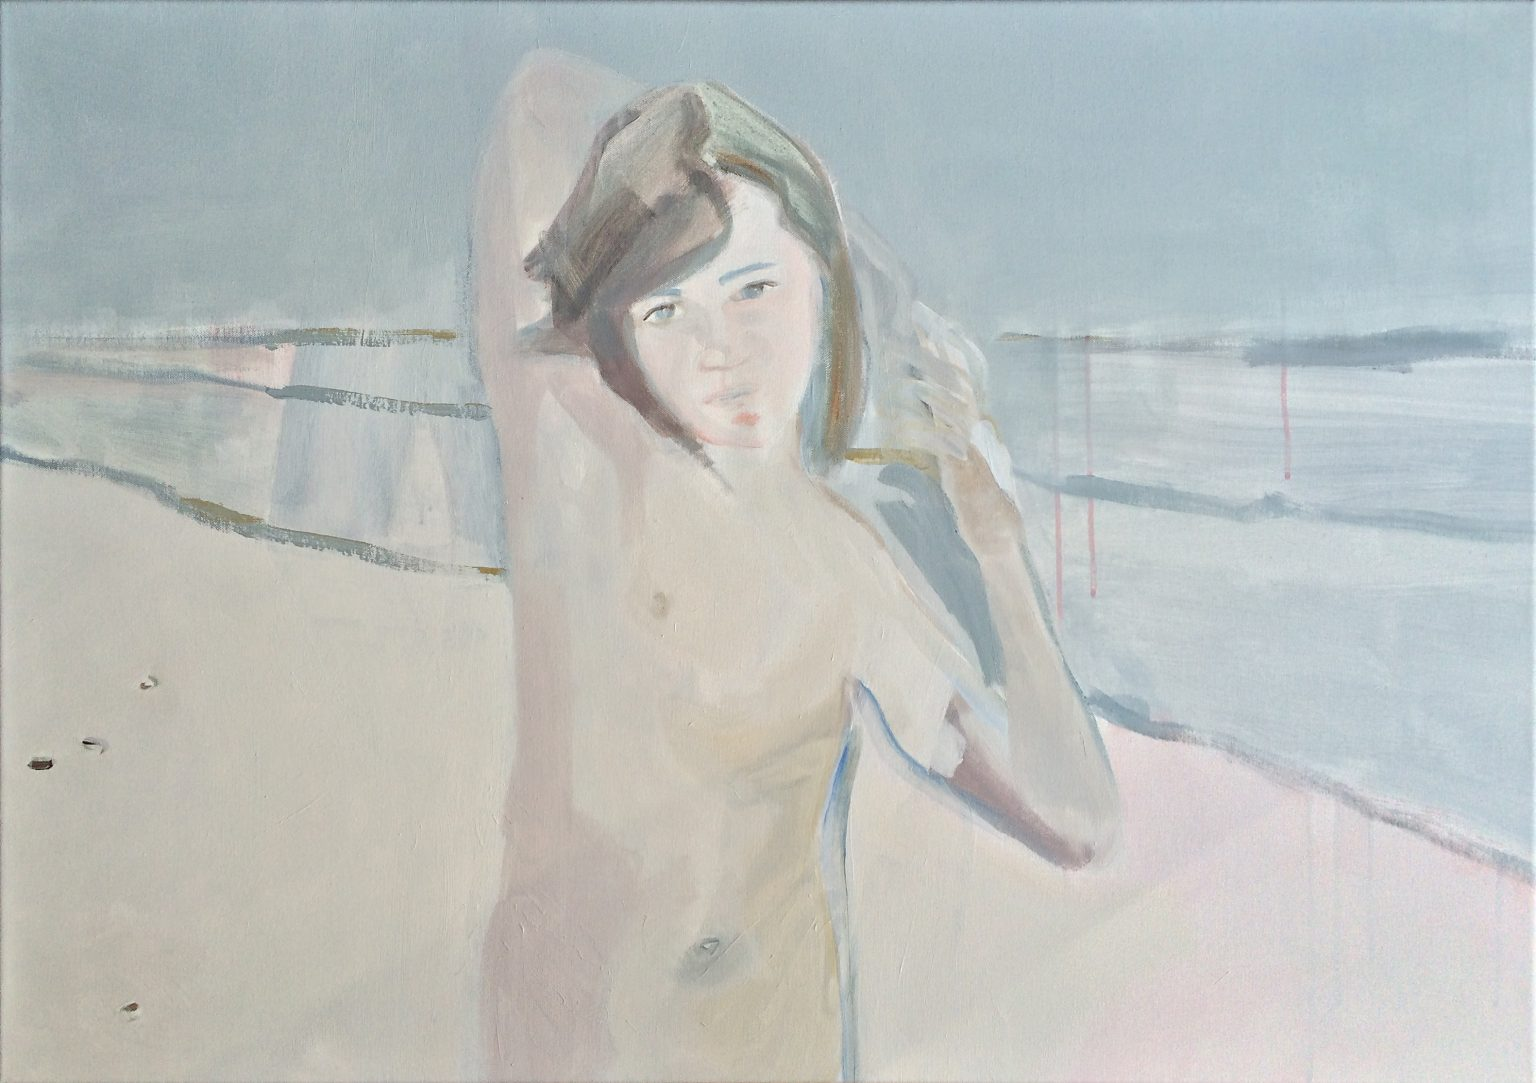 Sand 70x100 cm acrylics on canvas #SOLD